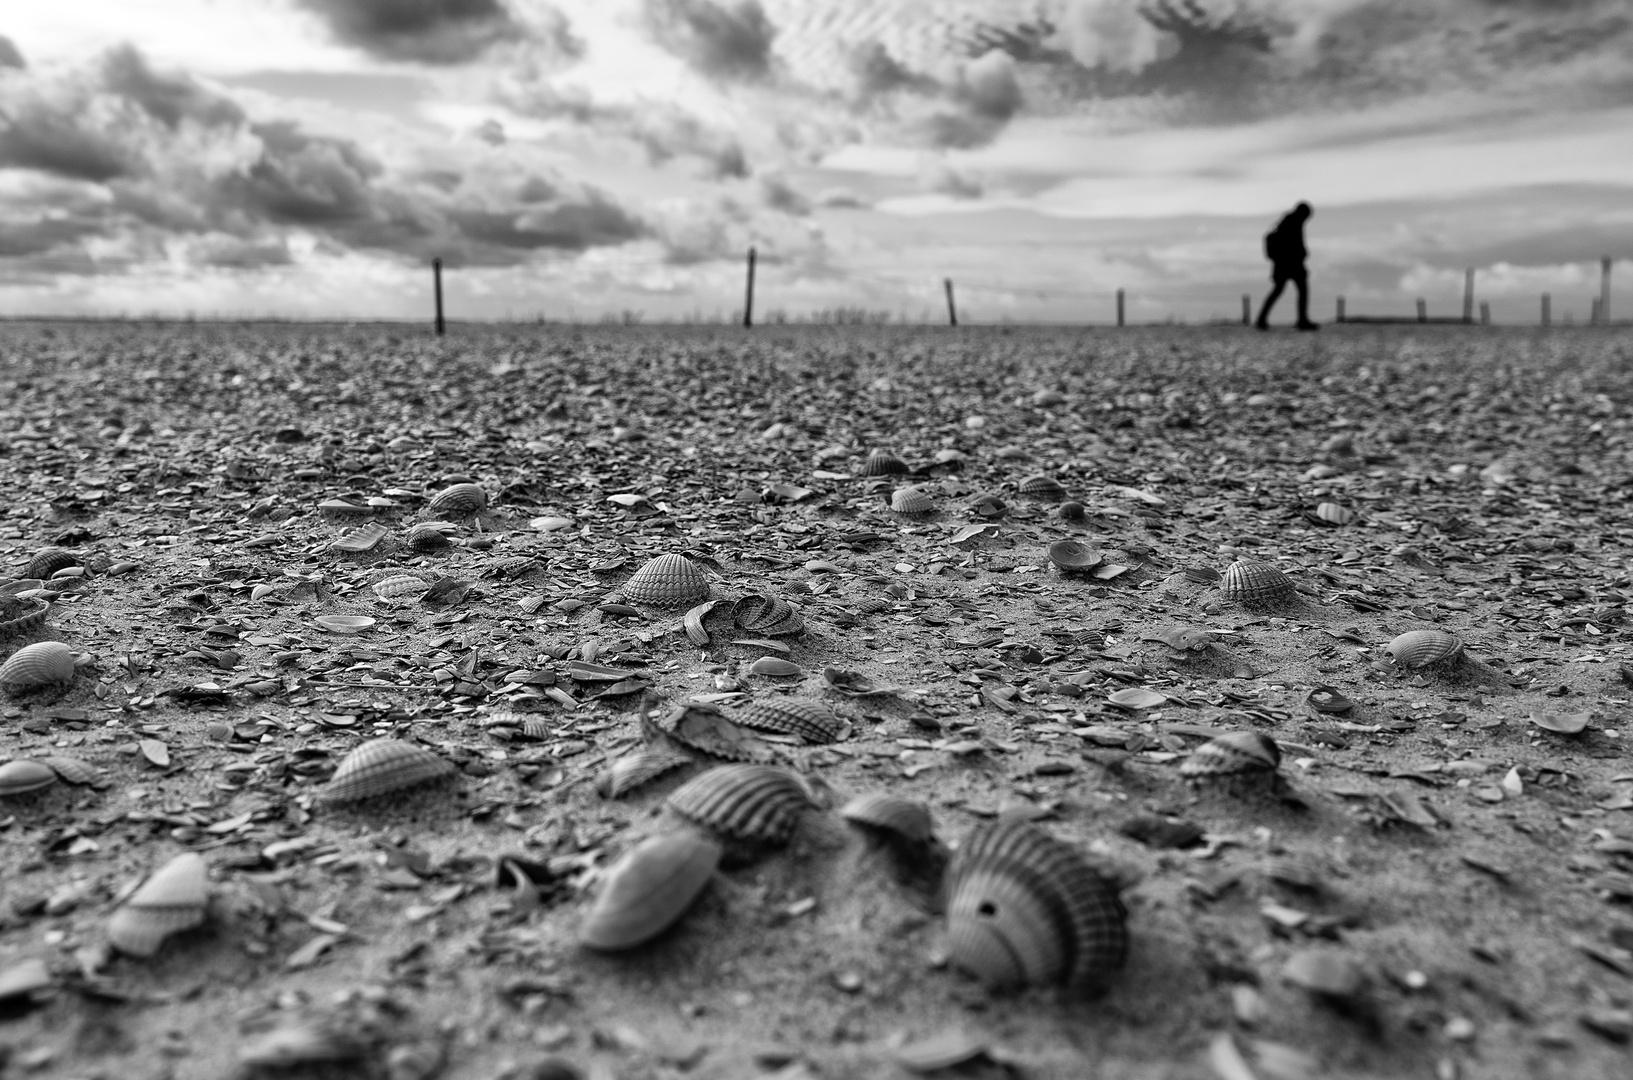 Sandmacher